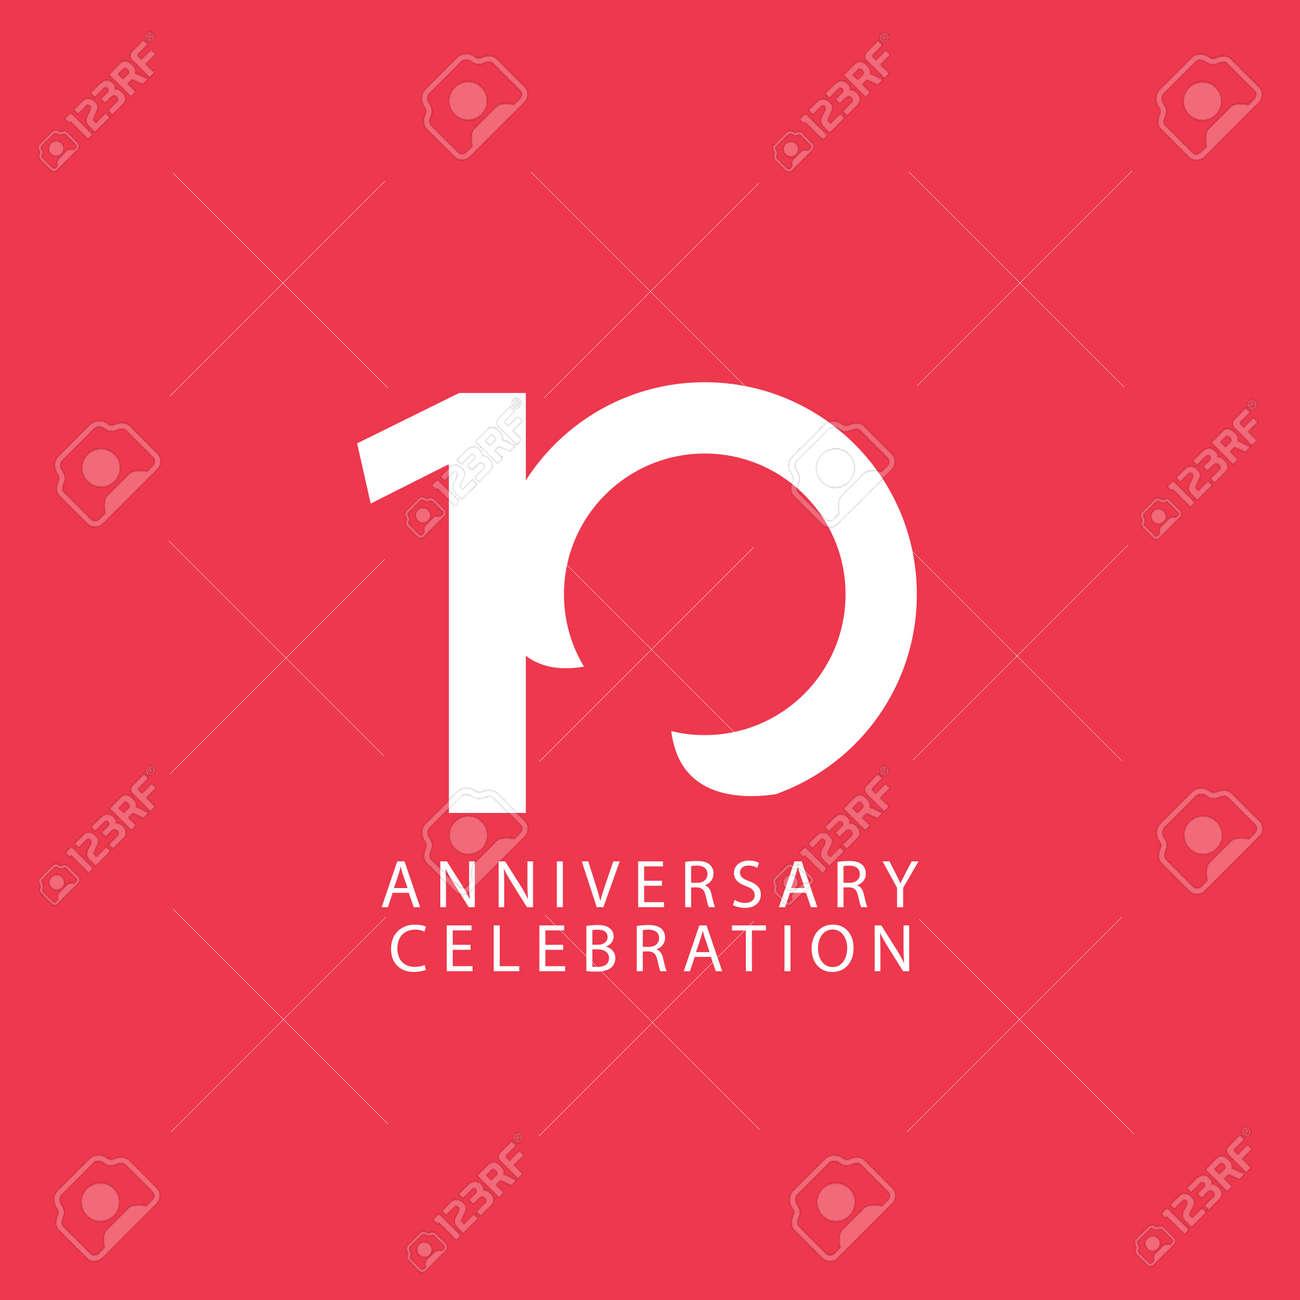 10 Years Anniversary Celebration Vector Template Design Illustration - 163698041